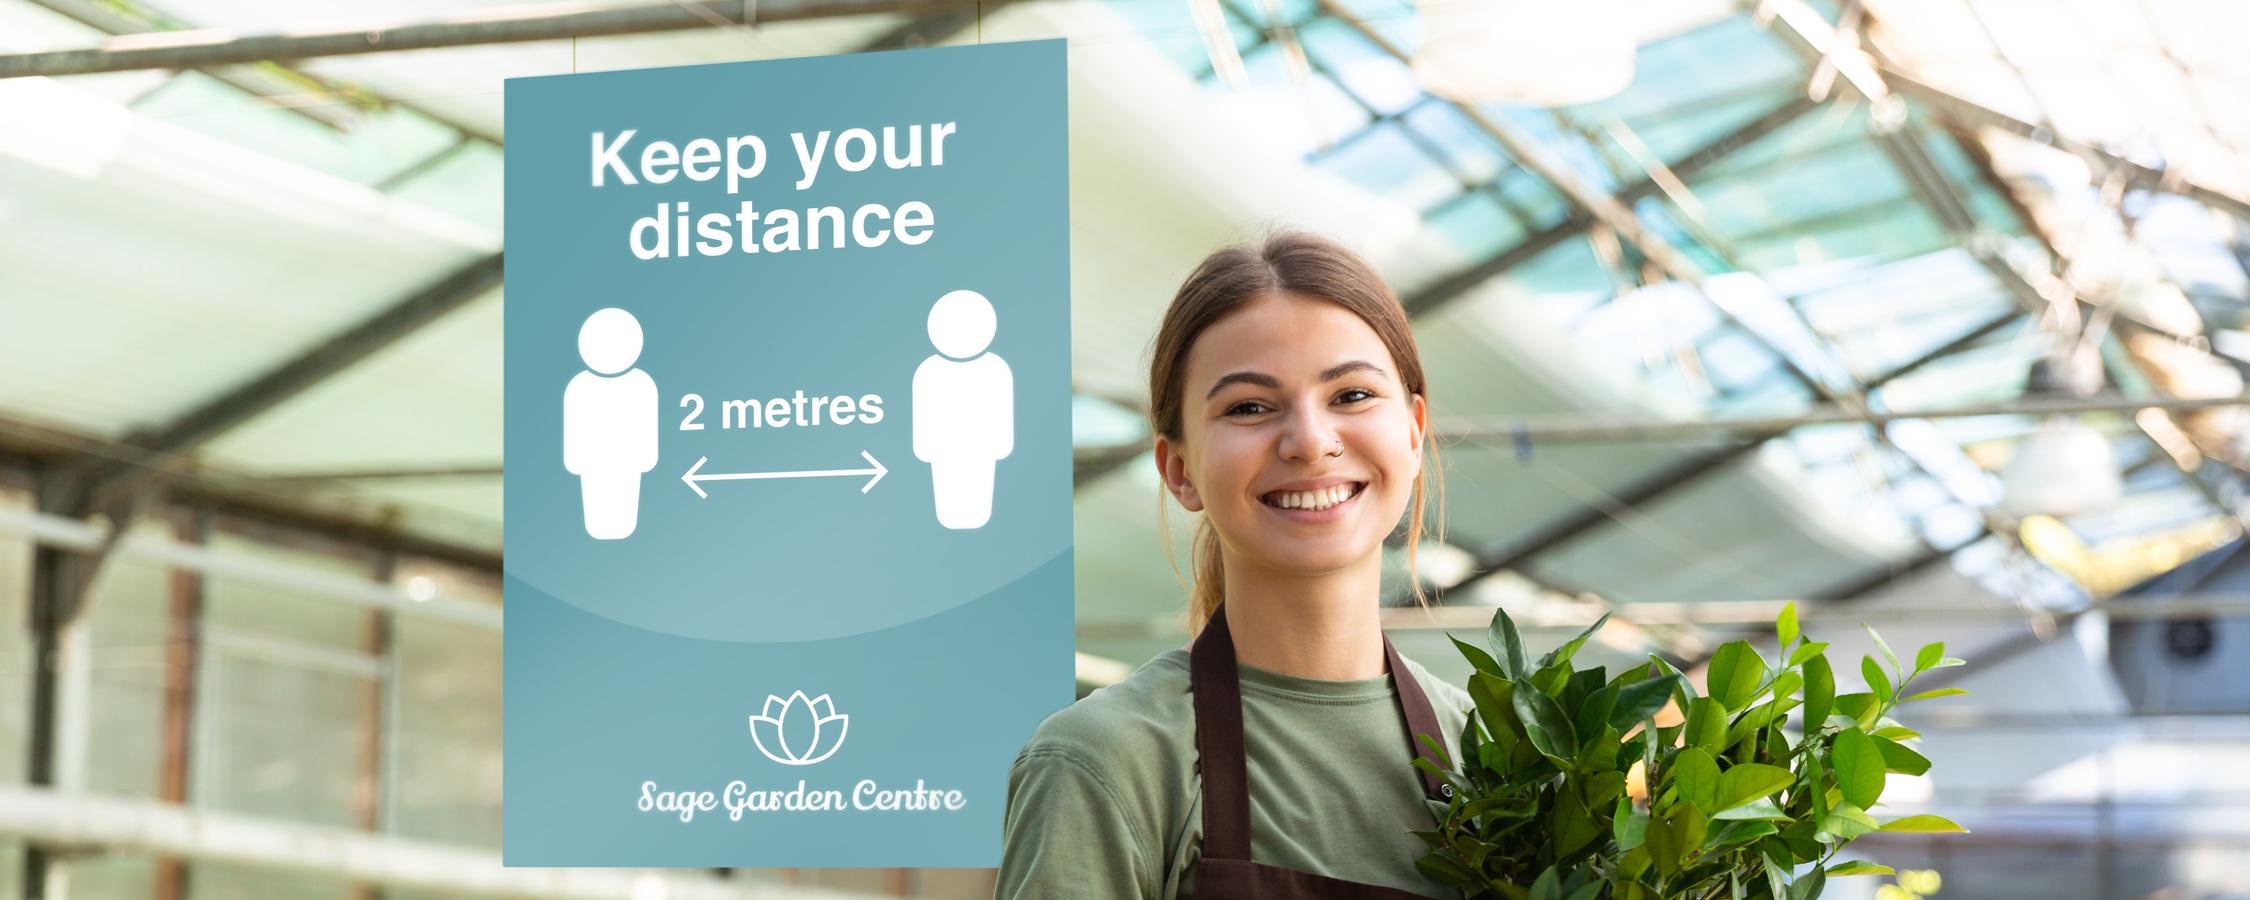 Garden Ceentre Social Distancing Signage